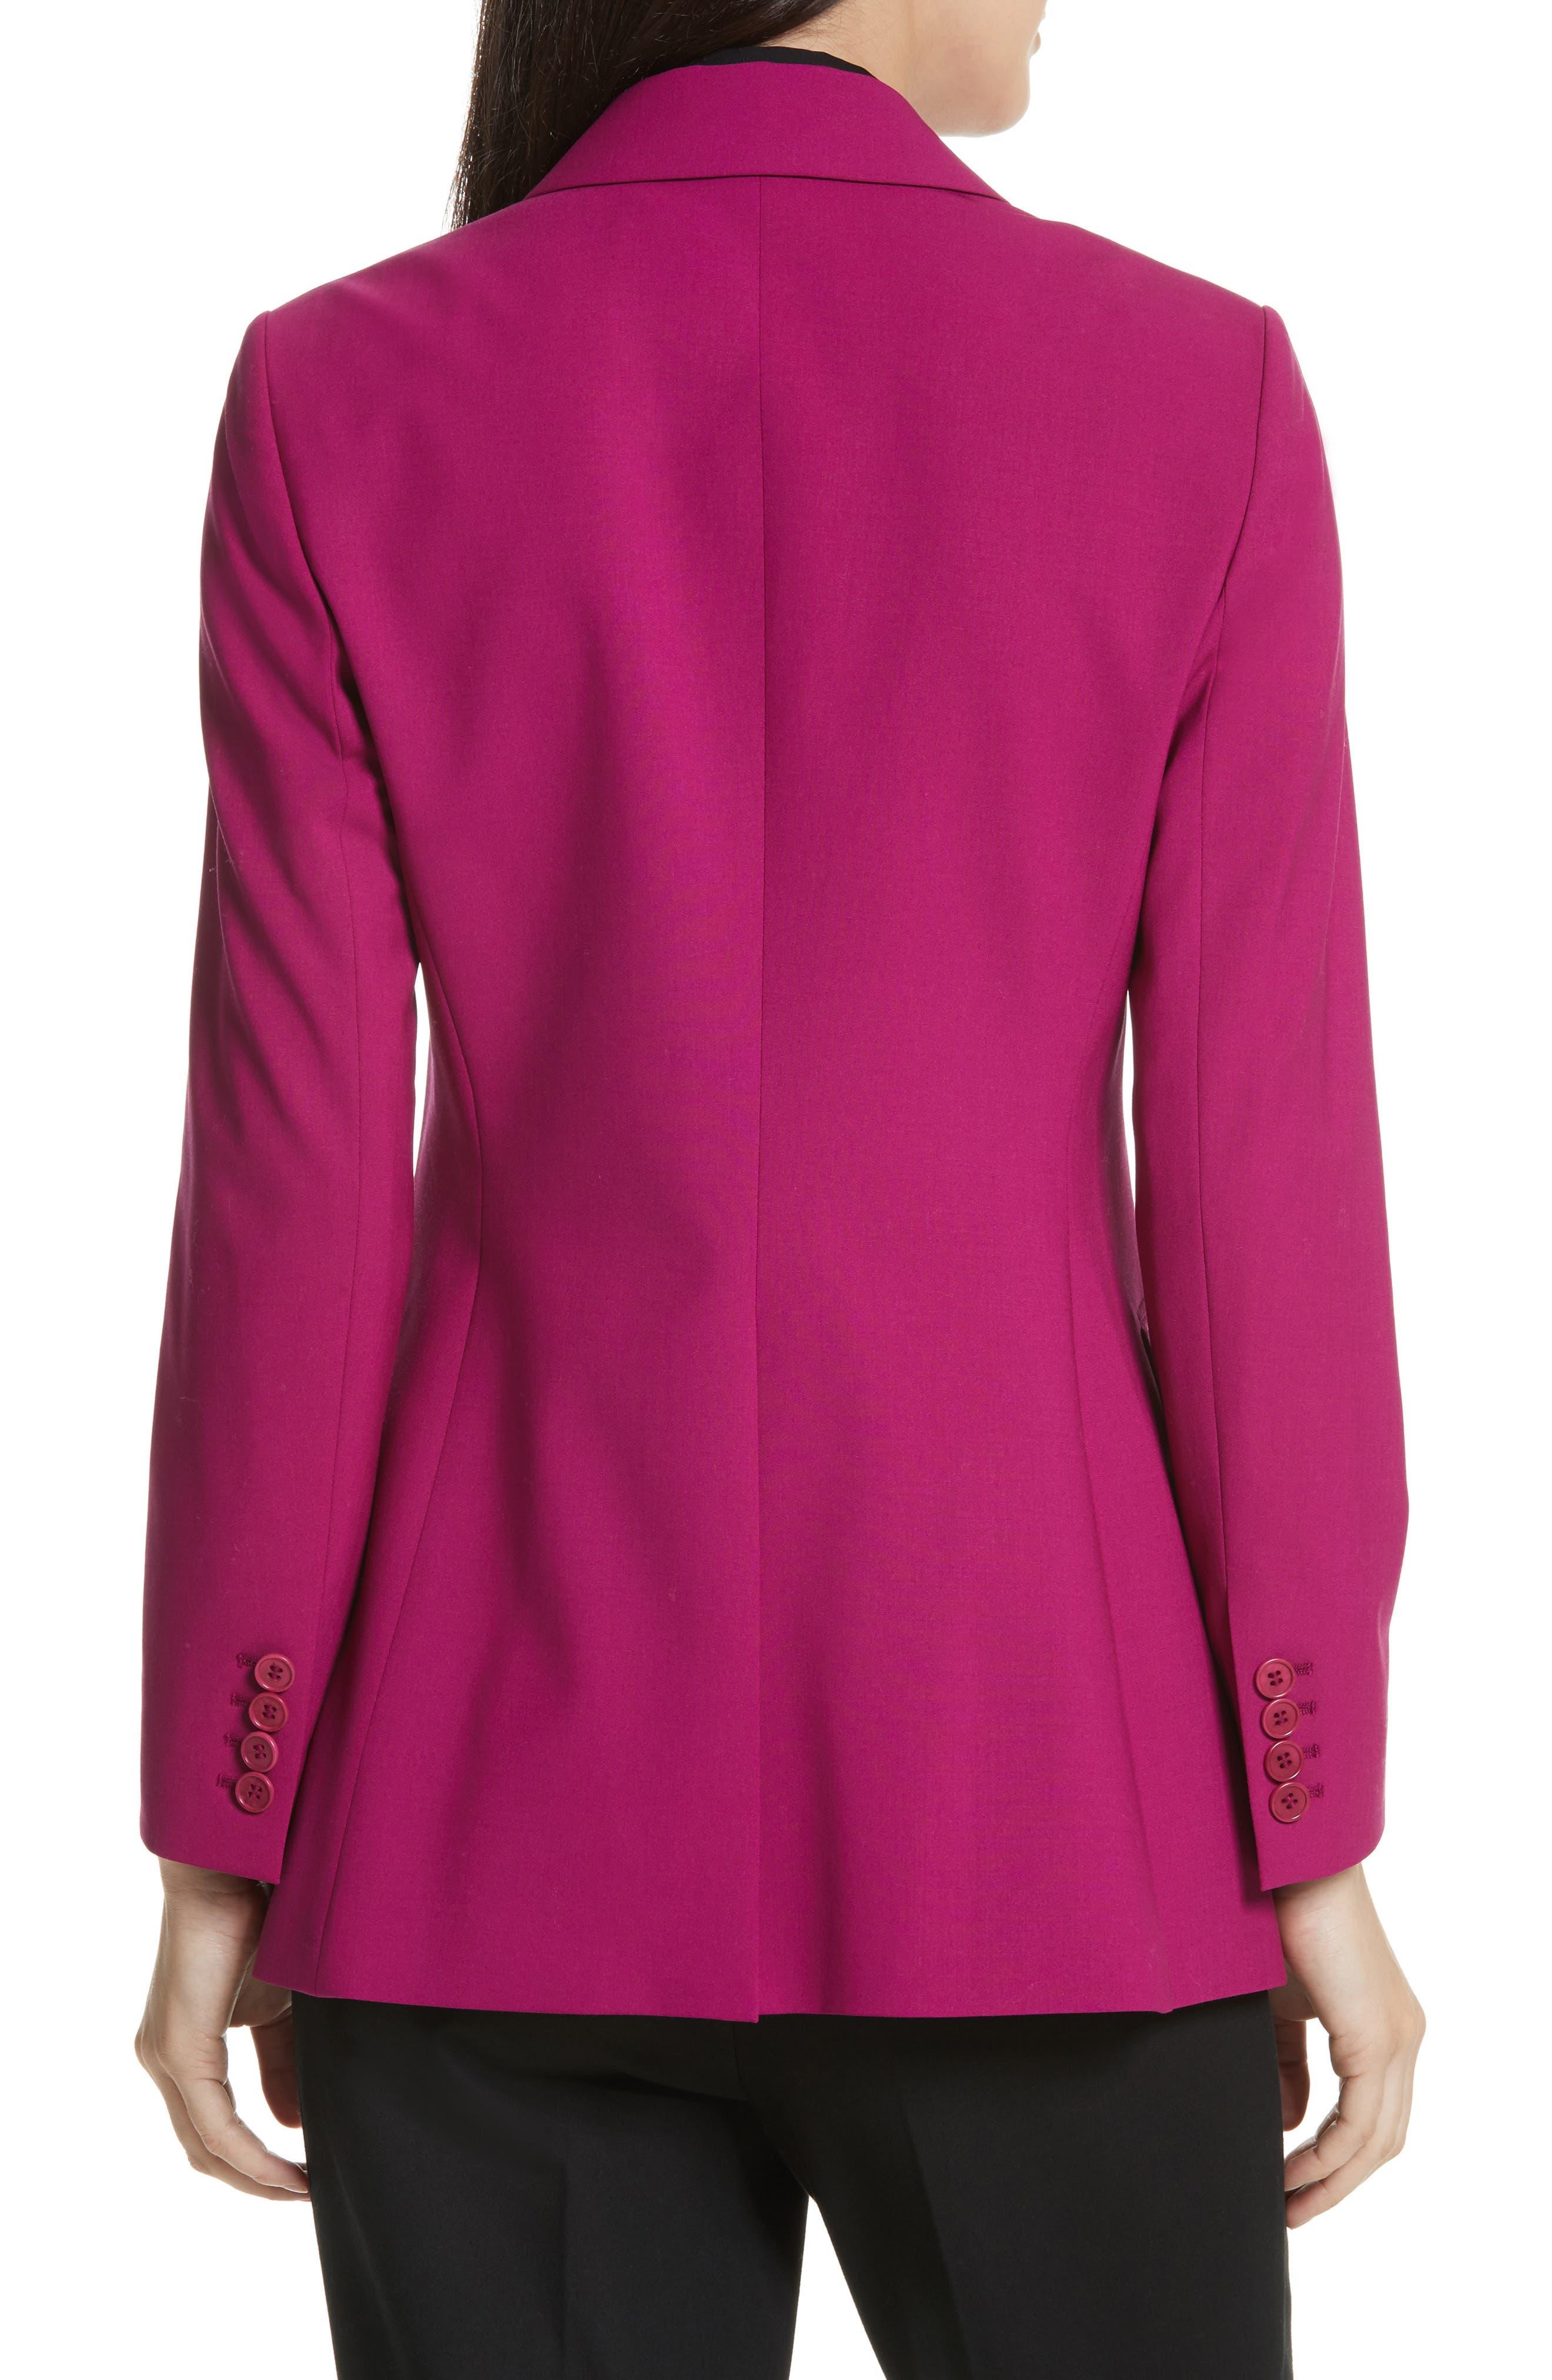 Etienette B Good Wool Suit Jacket,                             Alternate thumbnail 3, color,                             Electric Pink